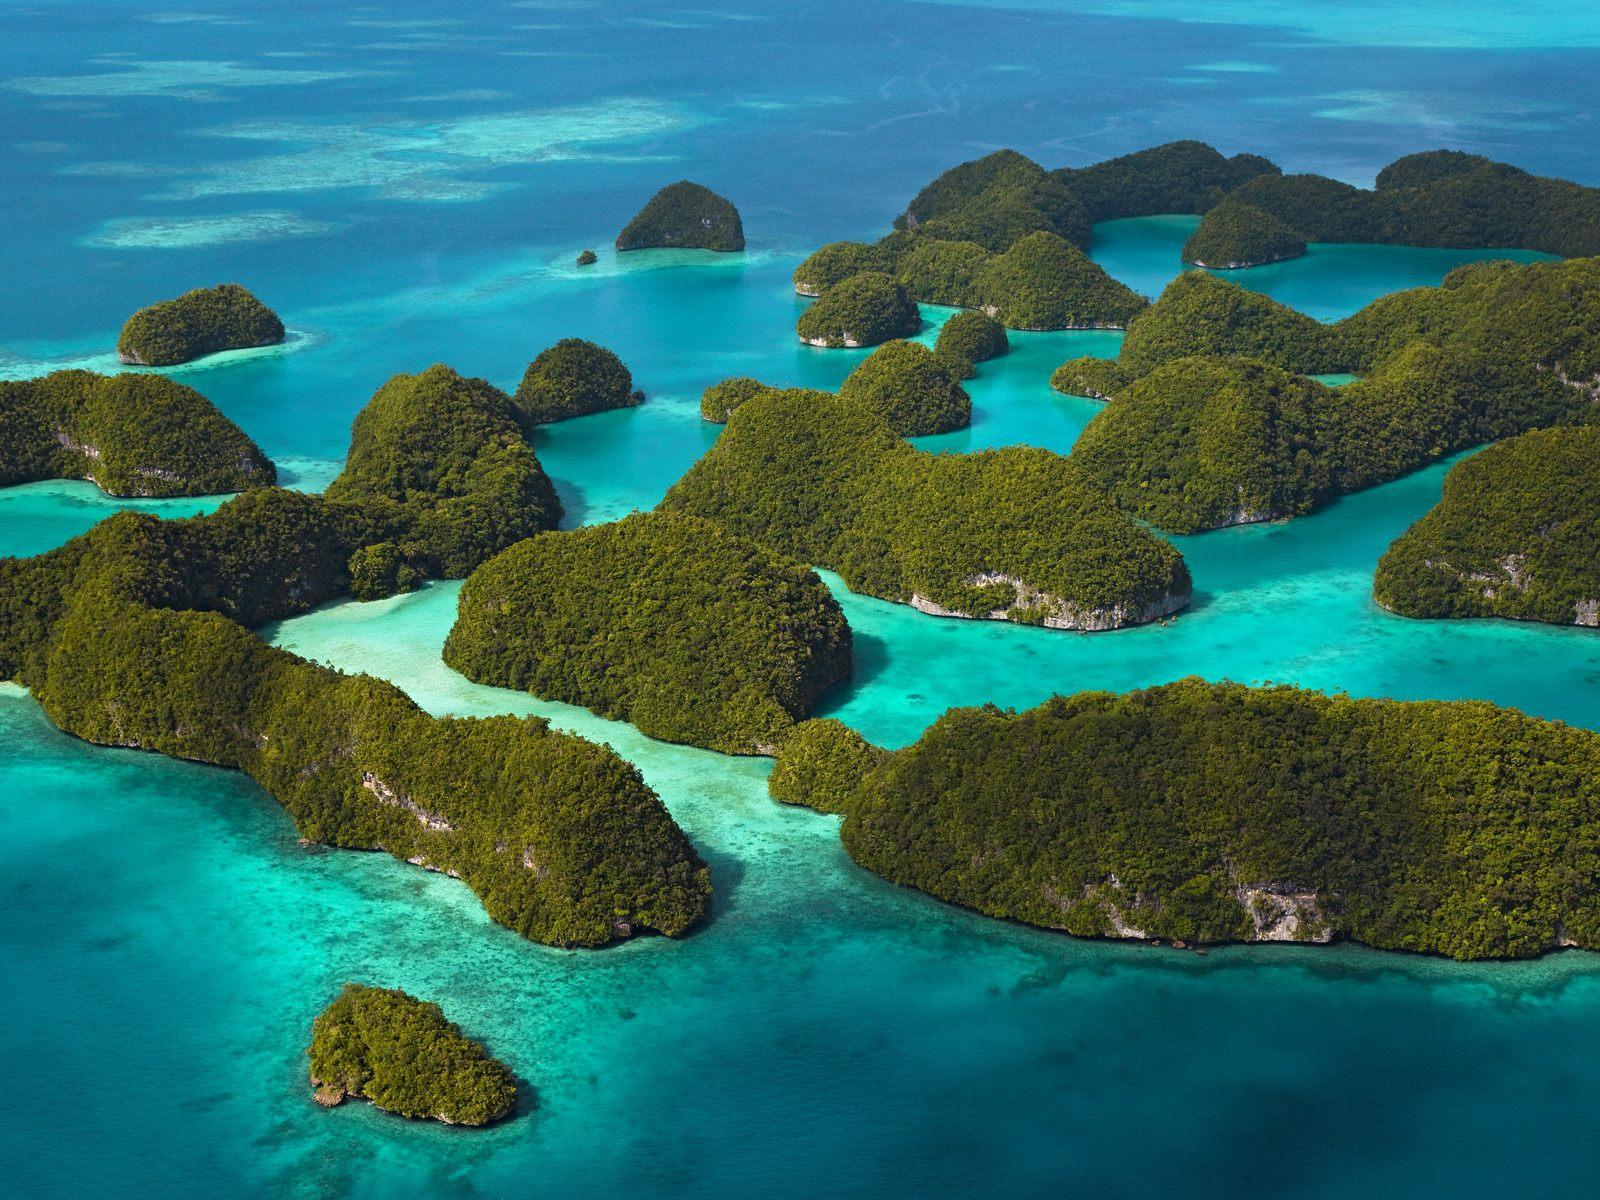 Zastaki.com - Красивые острова